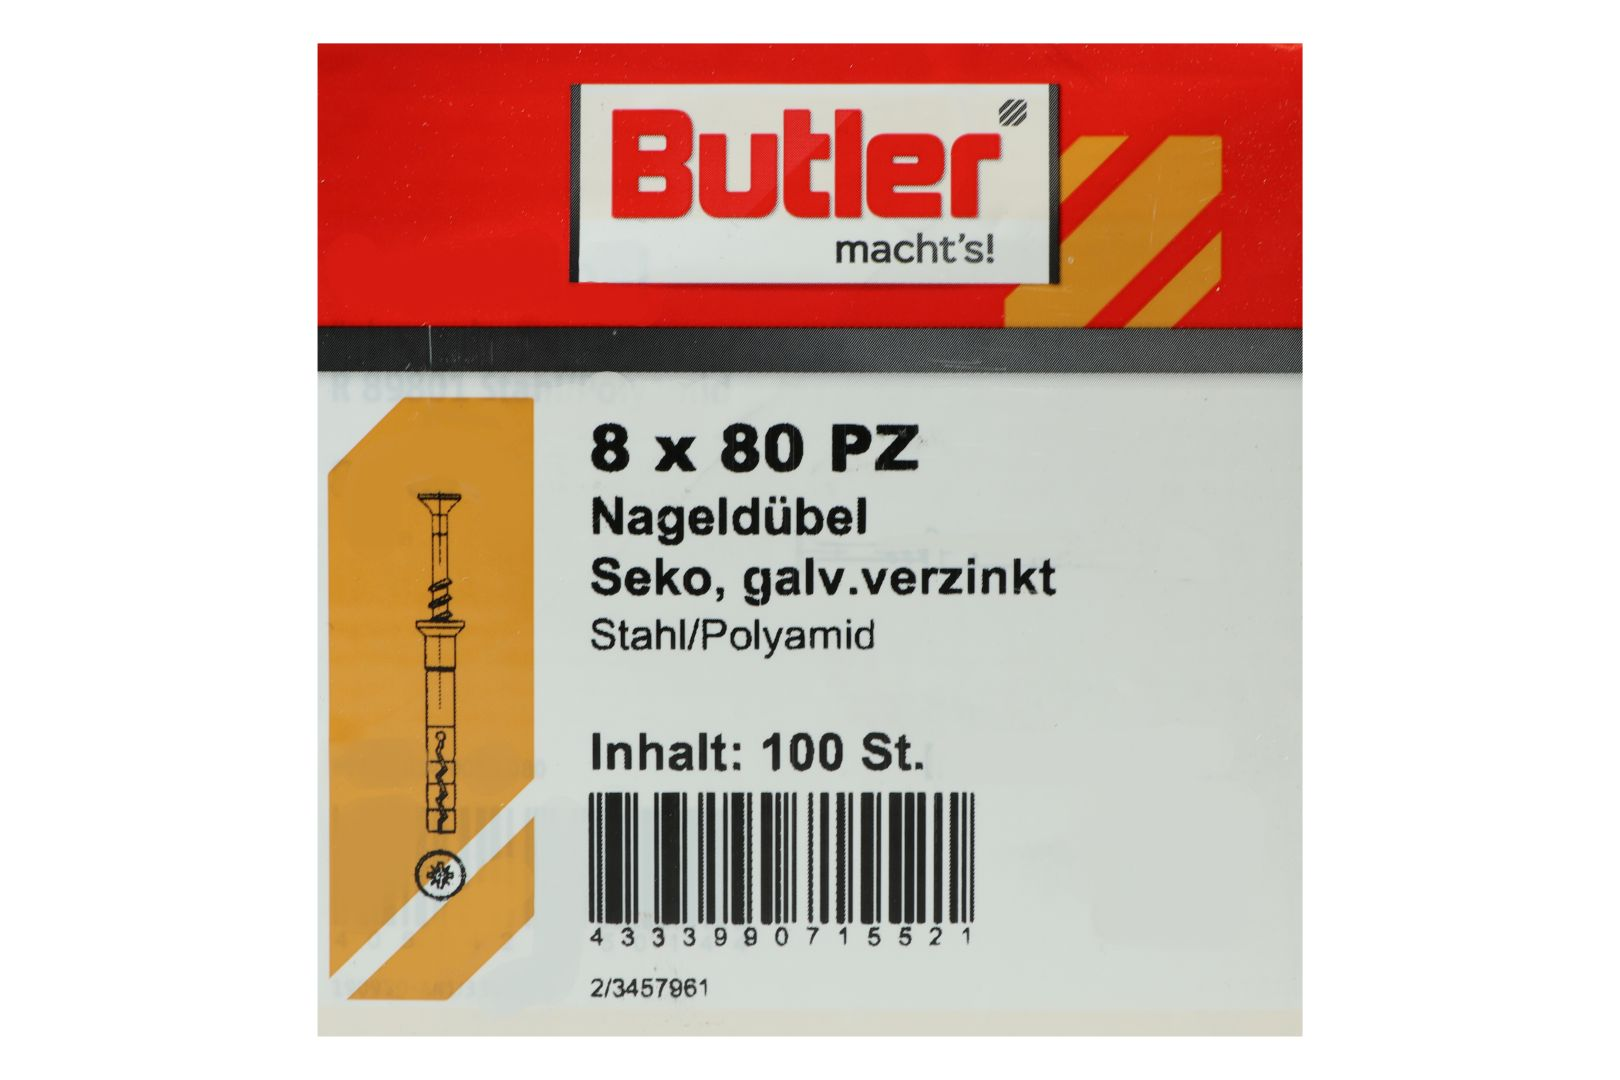 Butler macht's! Nageldübel, Stahl / Polyamid, Senkkopf, galvanisch verzinkt 8 x 80 mm, 100 Stück